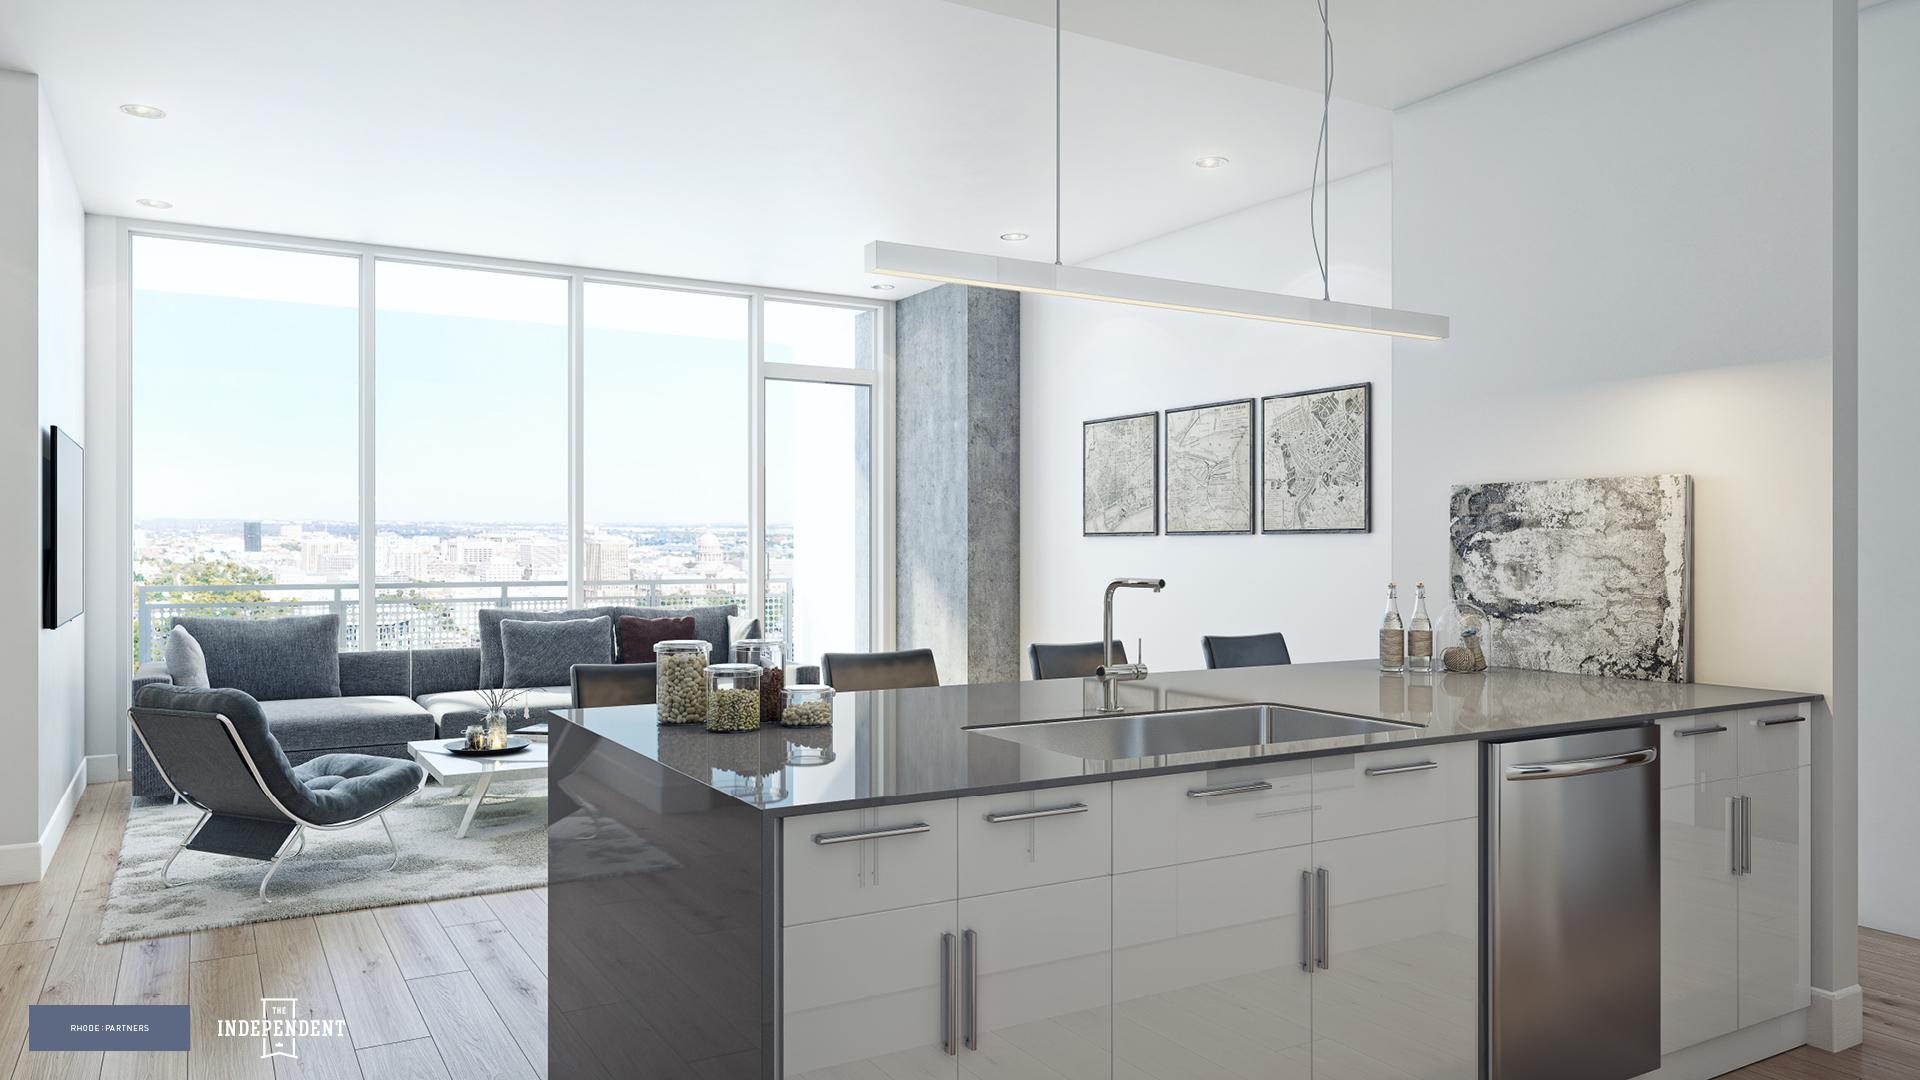 Interiors - B4 Kitchen Living.jpg